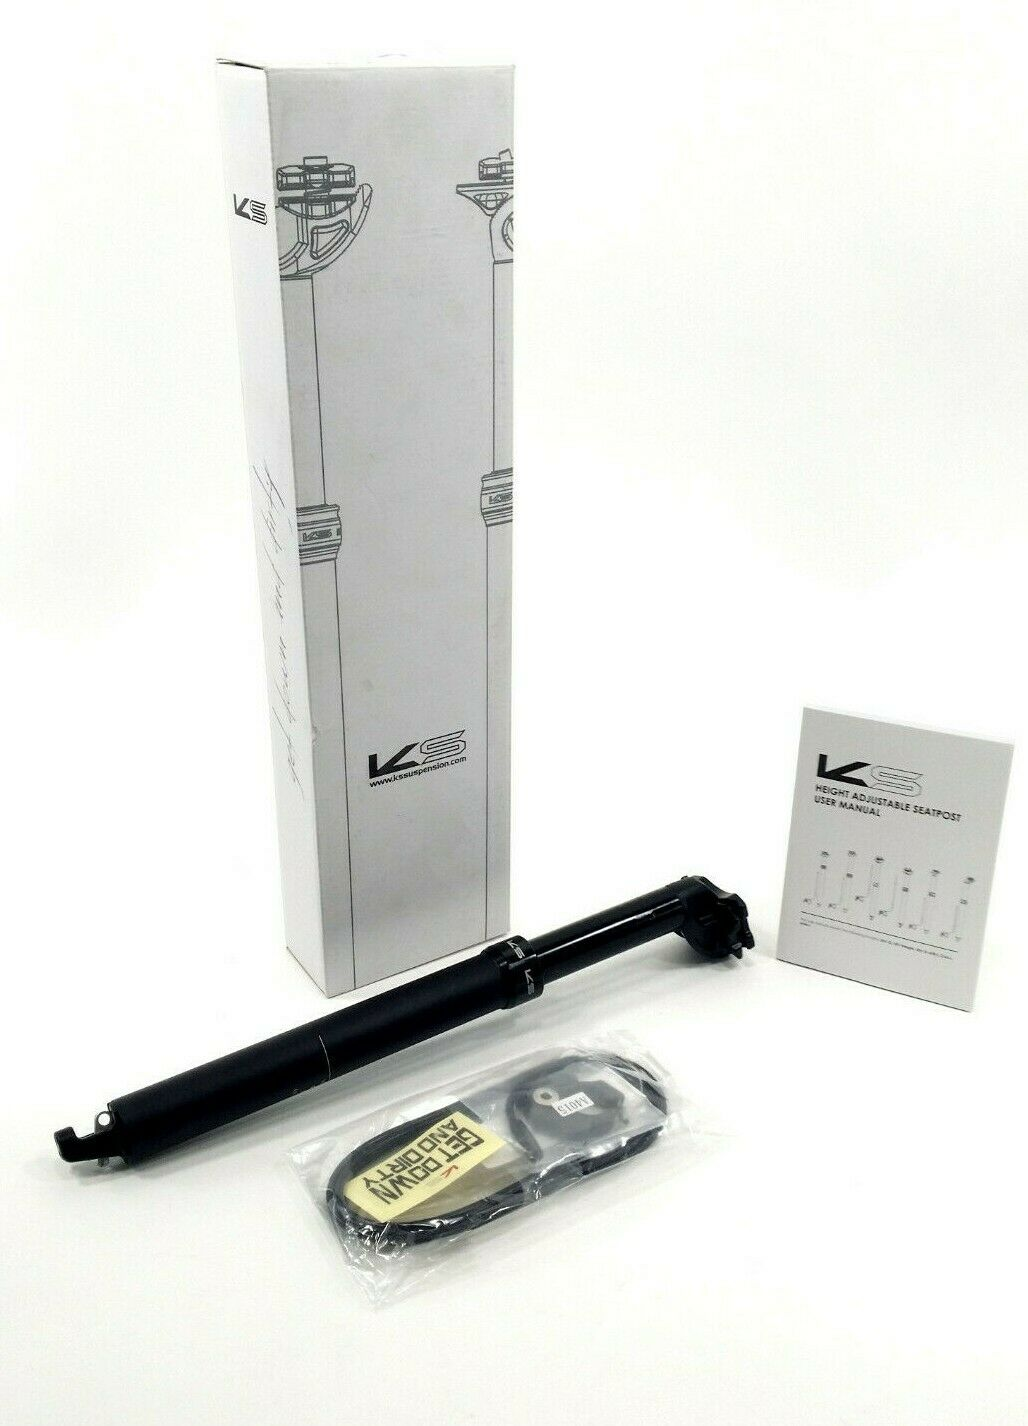 KindShock-Ten Integra Dropper tija de sillín E 20mm Offset 31.6mm 420 100mm de viaje